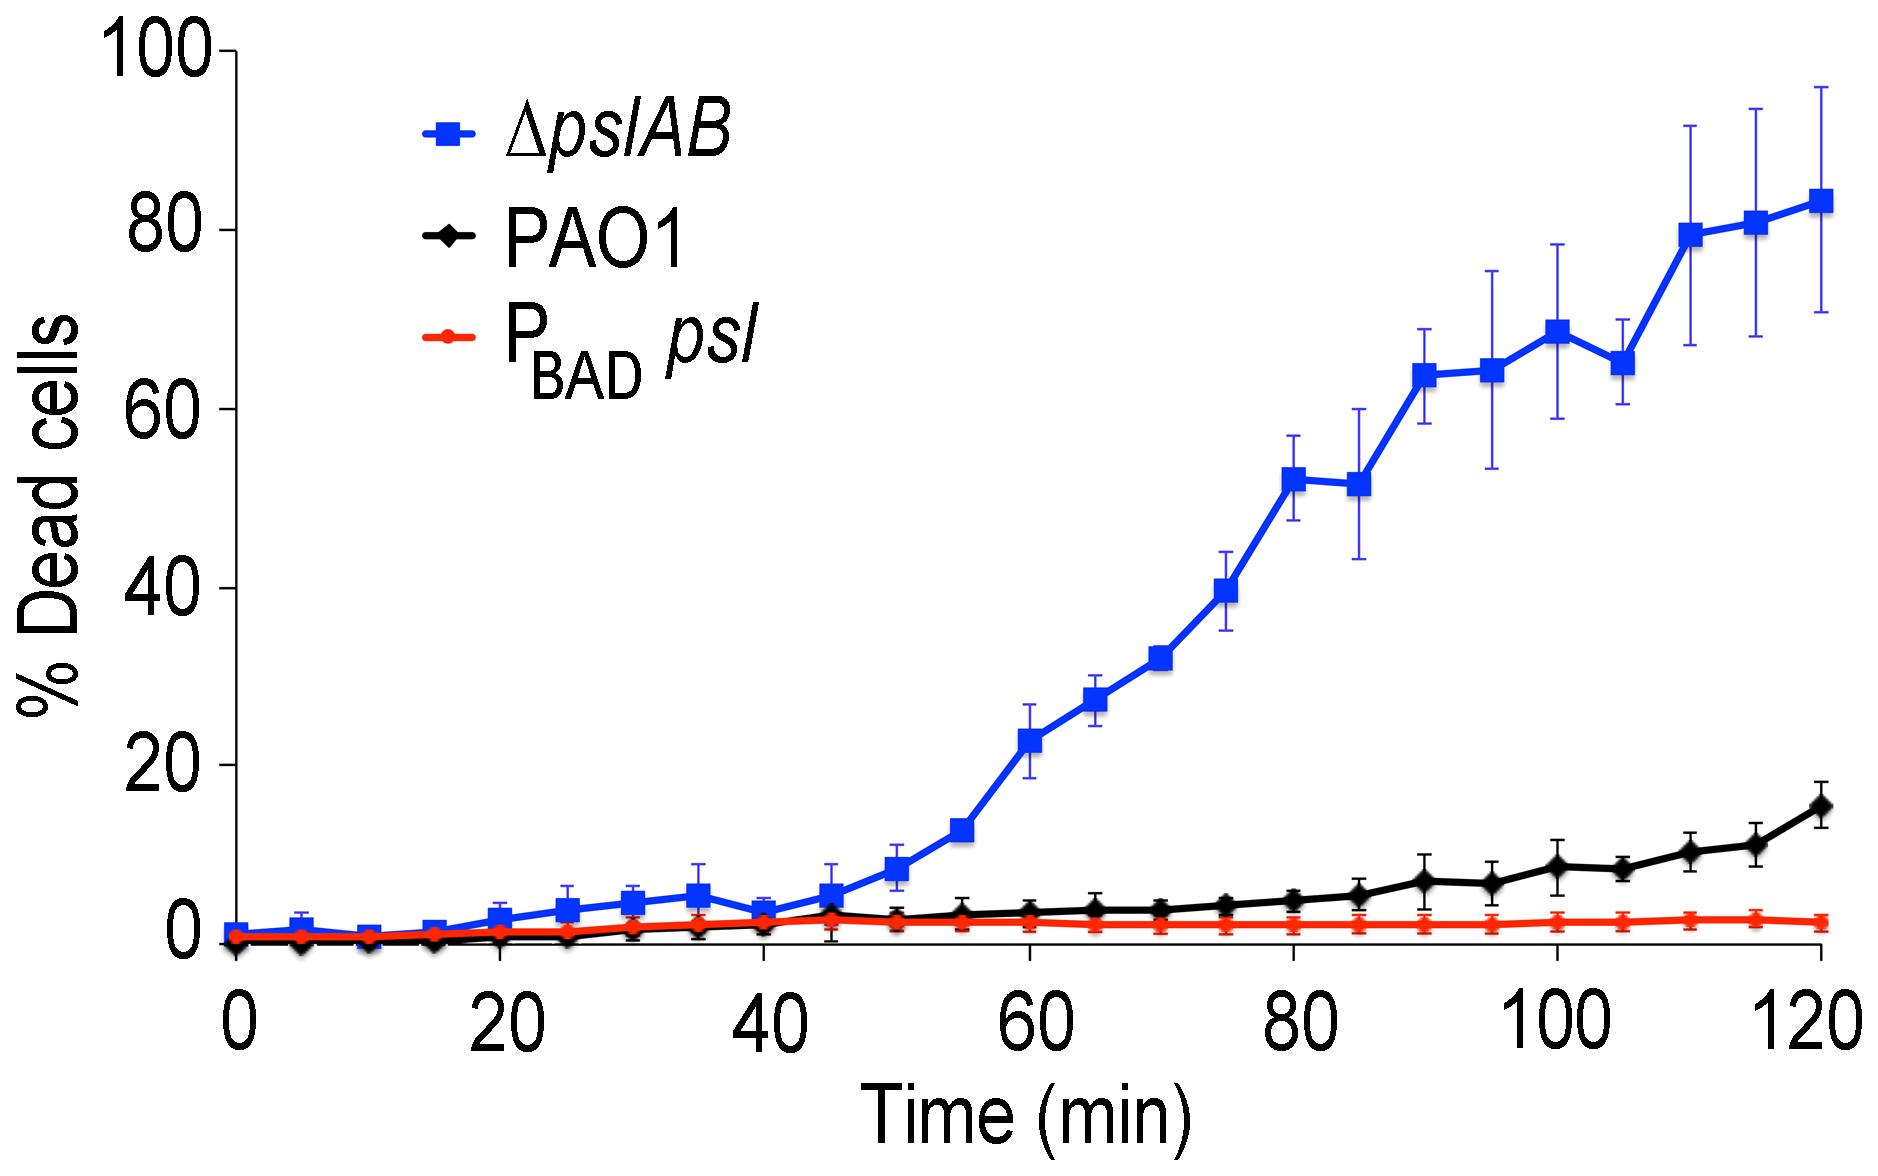 Psl contributes to colistin tolerance for biofilms grown under flow.